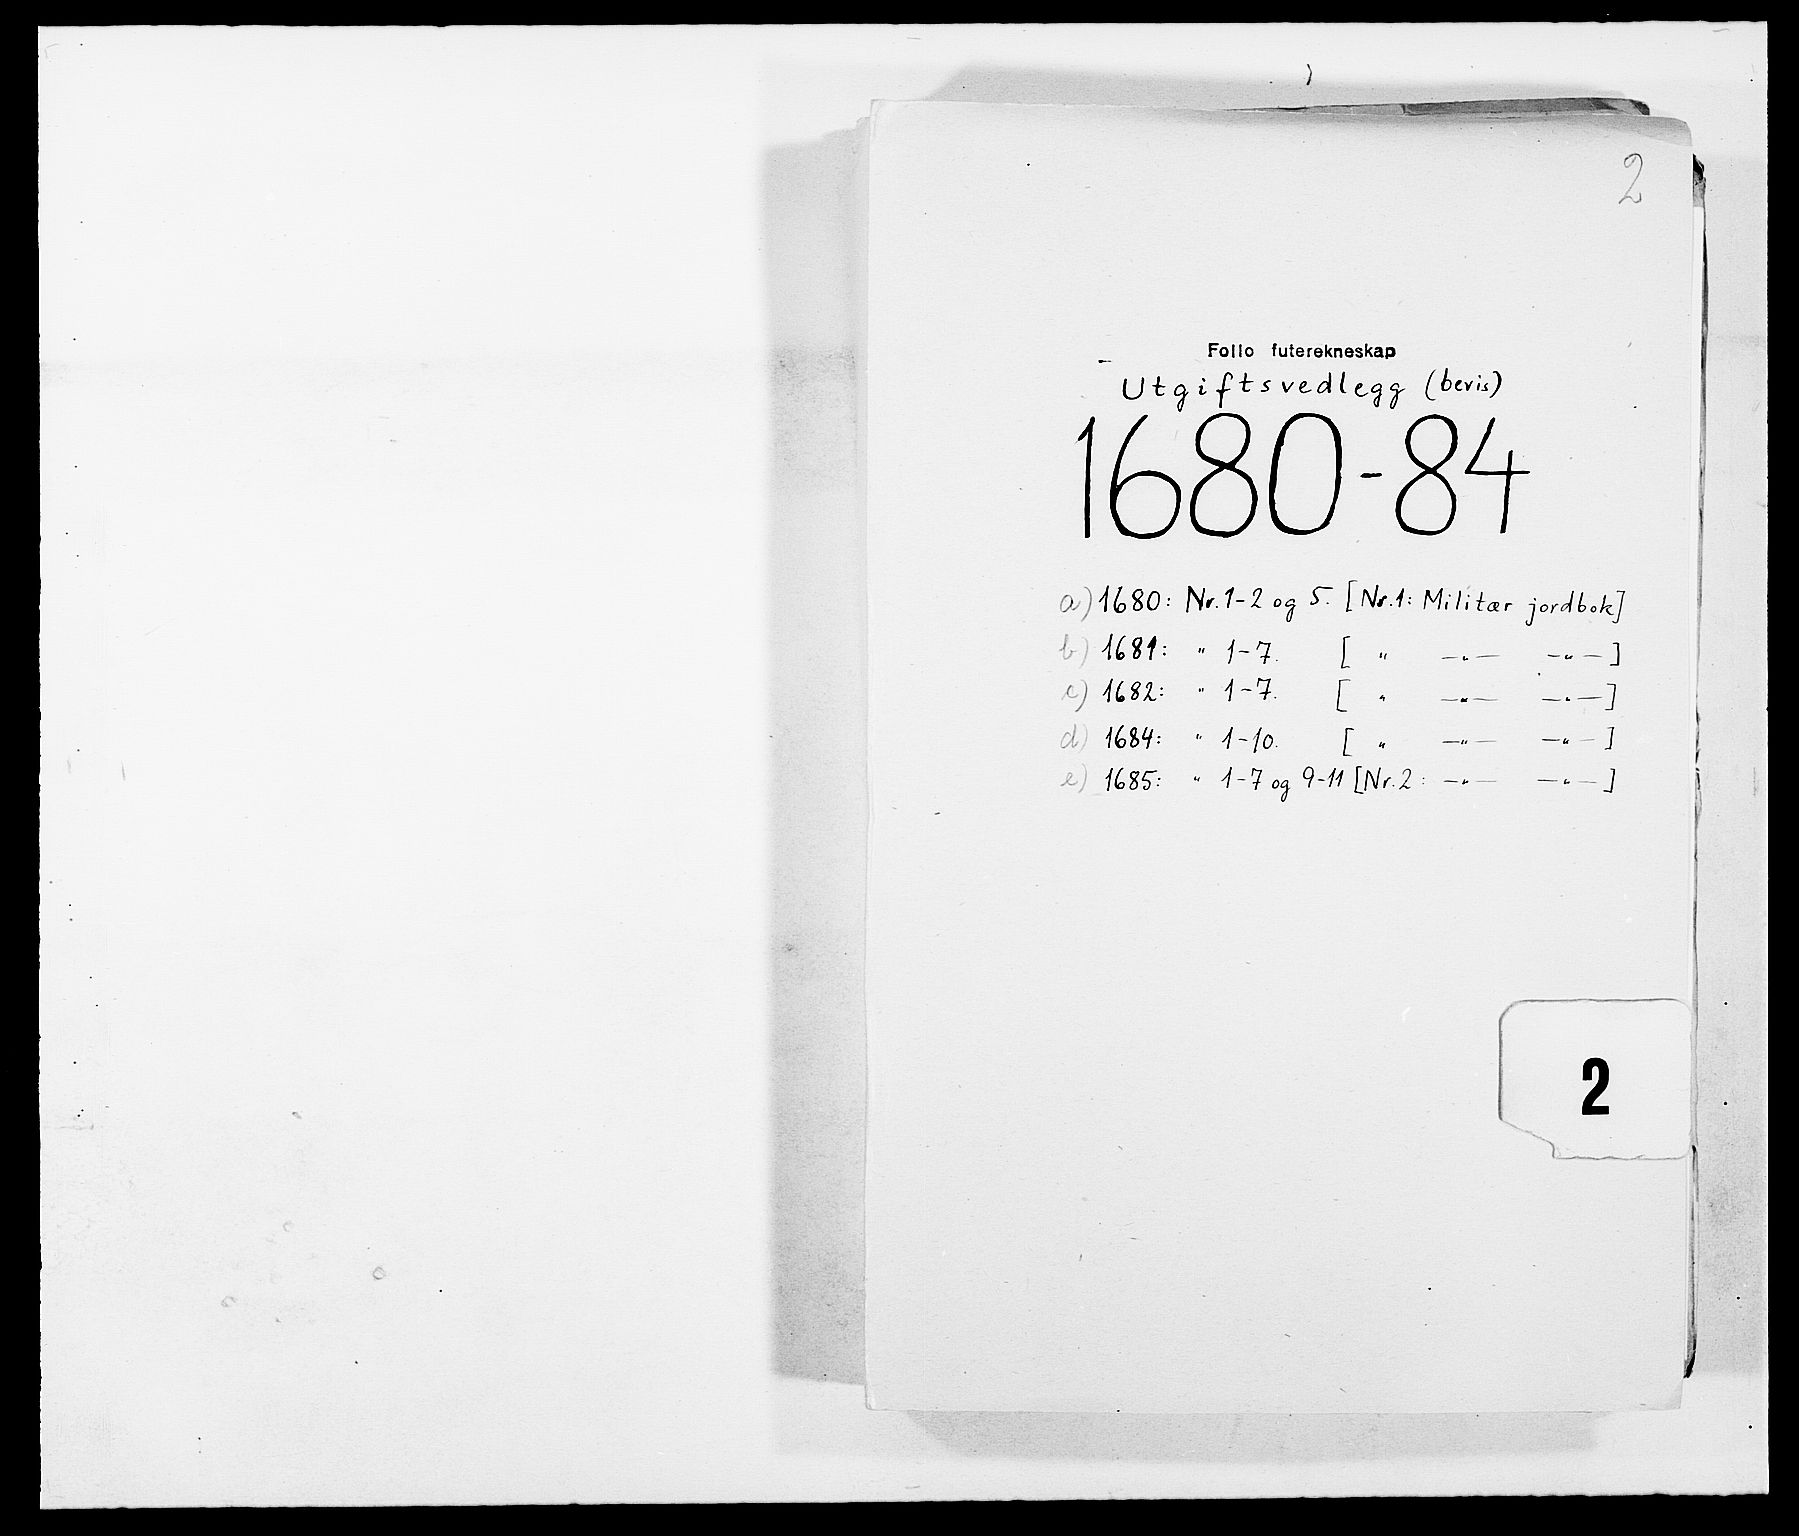 RA, Rentekammeret inntil 1814, Reviderte regnskaper, Fogderegnskap, R09/L0432: Fogderegnskap Follo, 1680-1684, s. 1